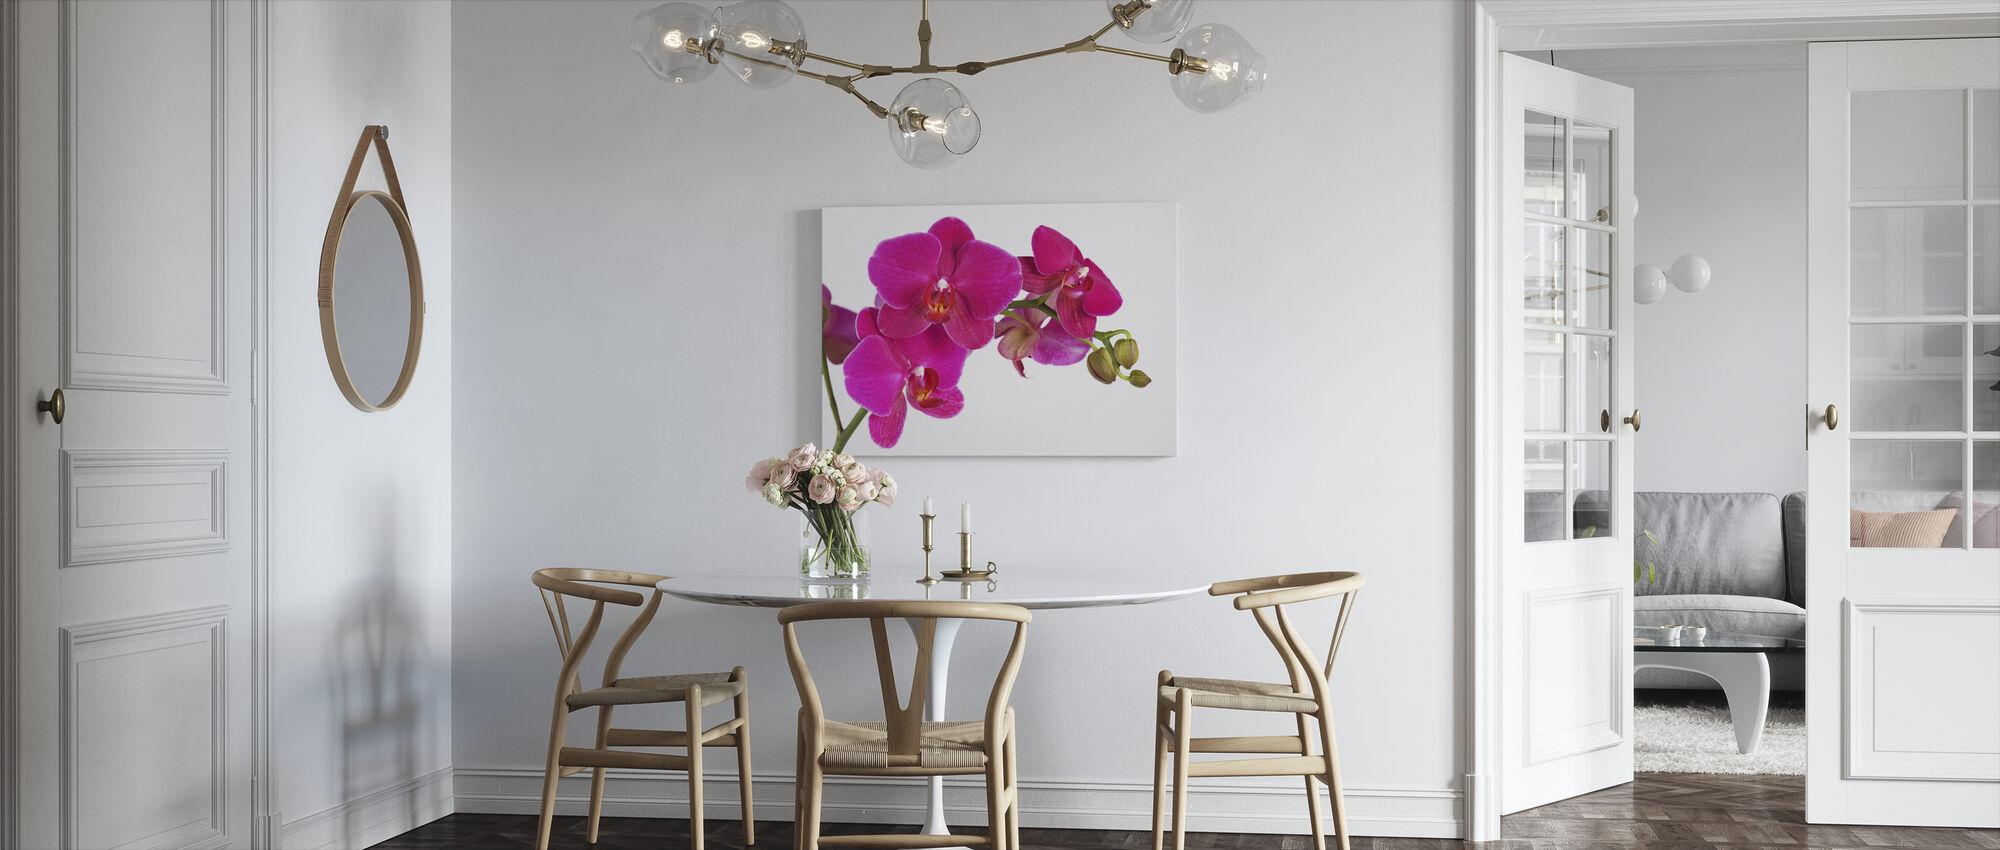 Orchidee - White Background - Canvas print - Kitchen